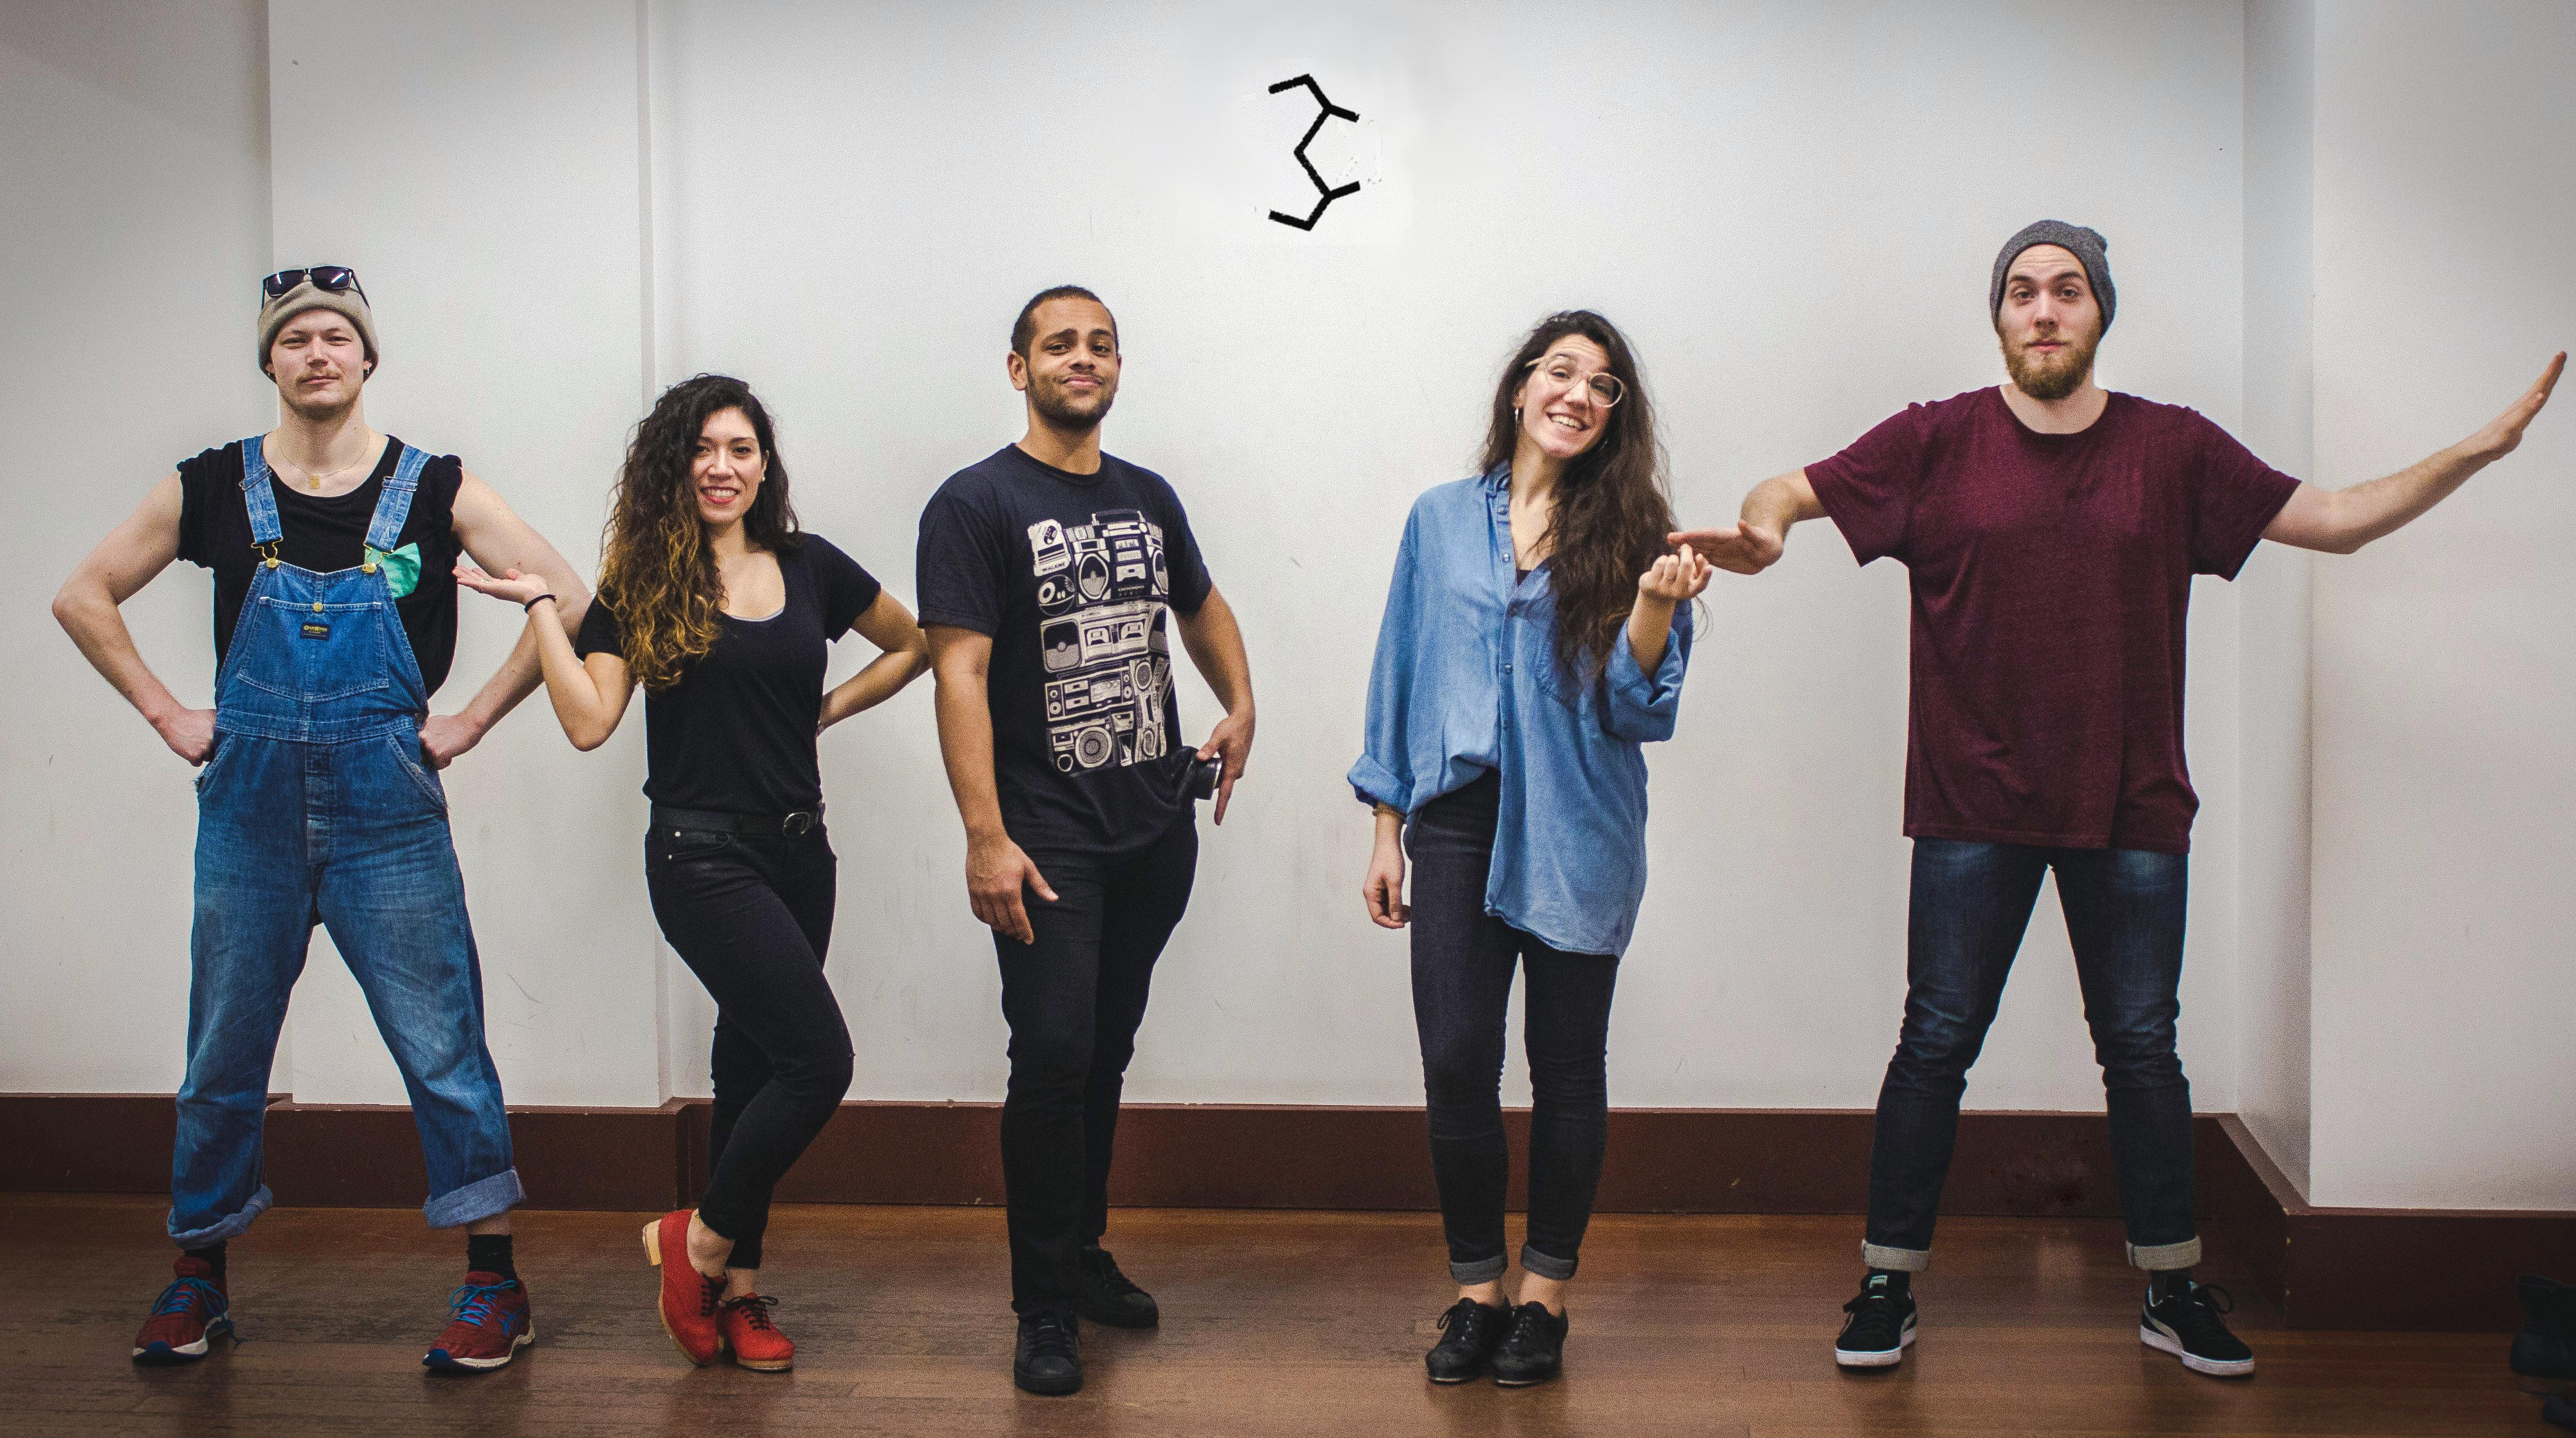 3c - Tap dance company